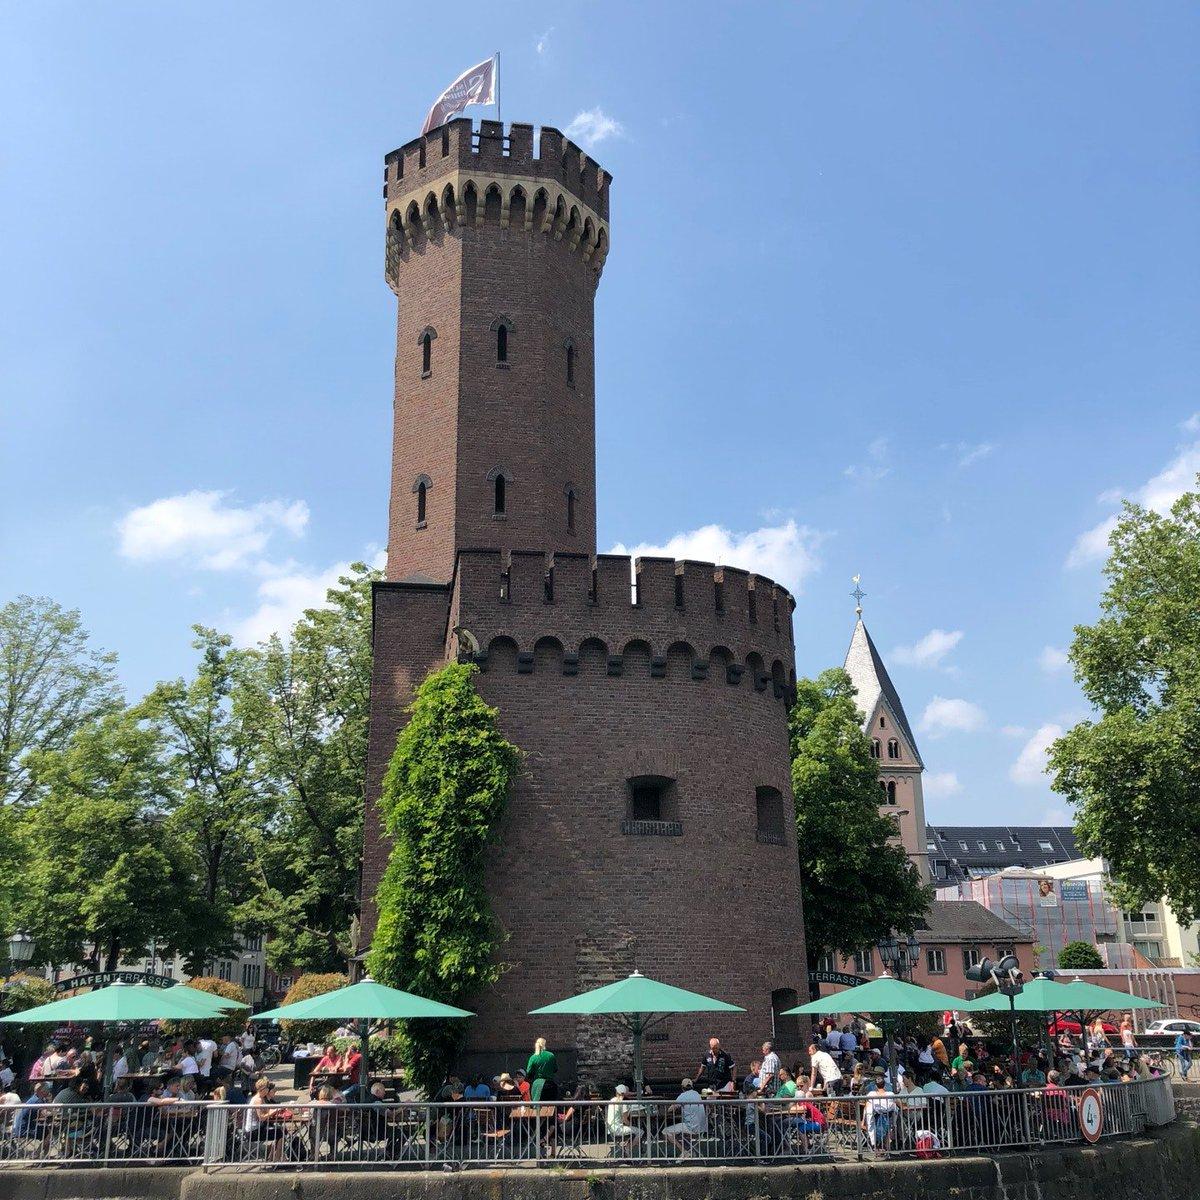 #Pfingstwetter! (Noch). (@ Malakoffturm in Köln) https://www.swarmapp.com/c/b83JyniZCxQ